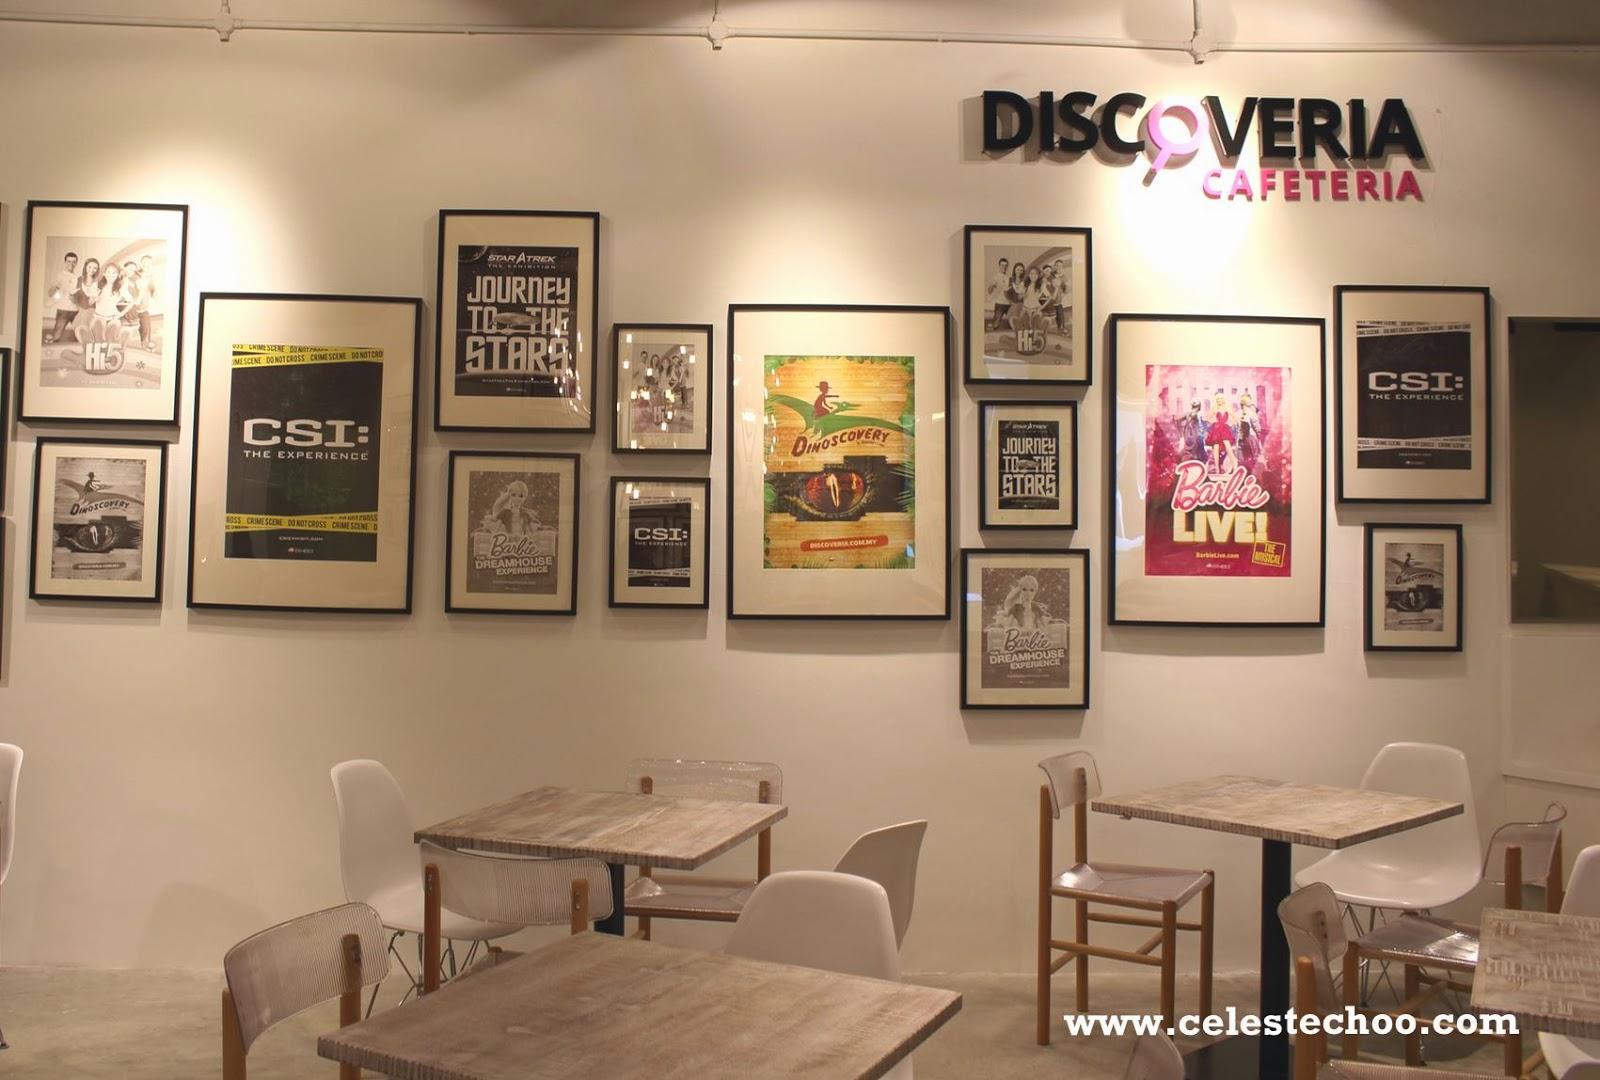 dinoscovery_dinosaurs_alive_avenue_k_discoveria_cafeteria